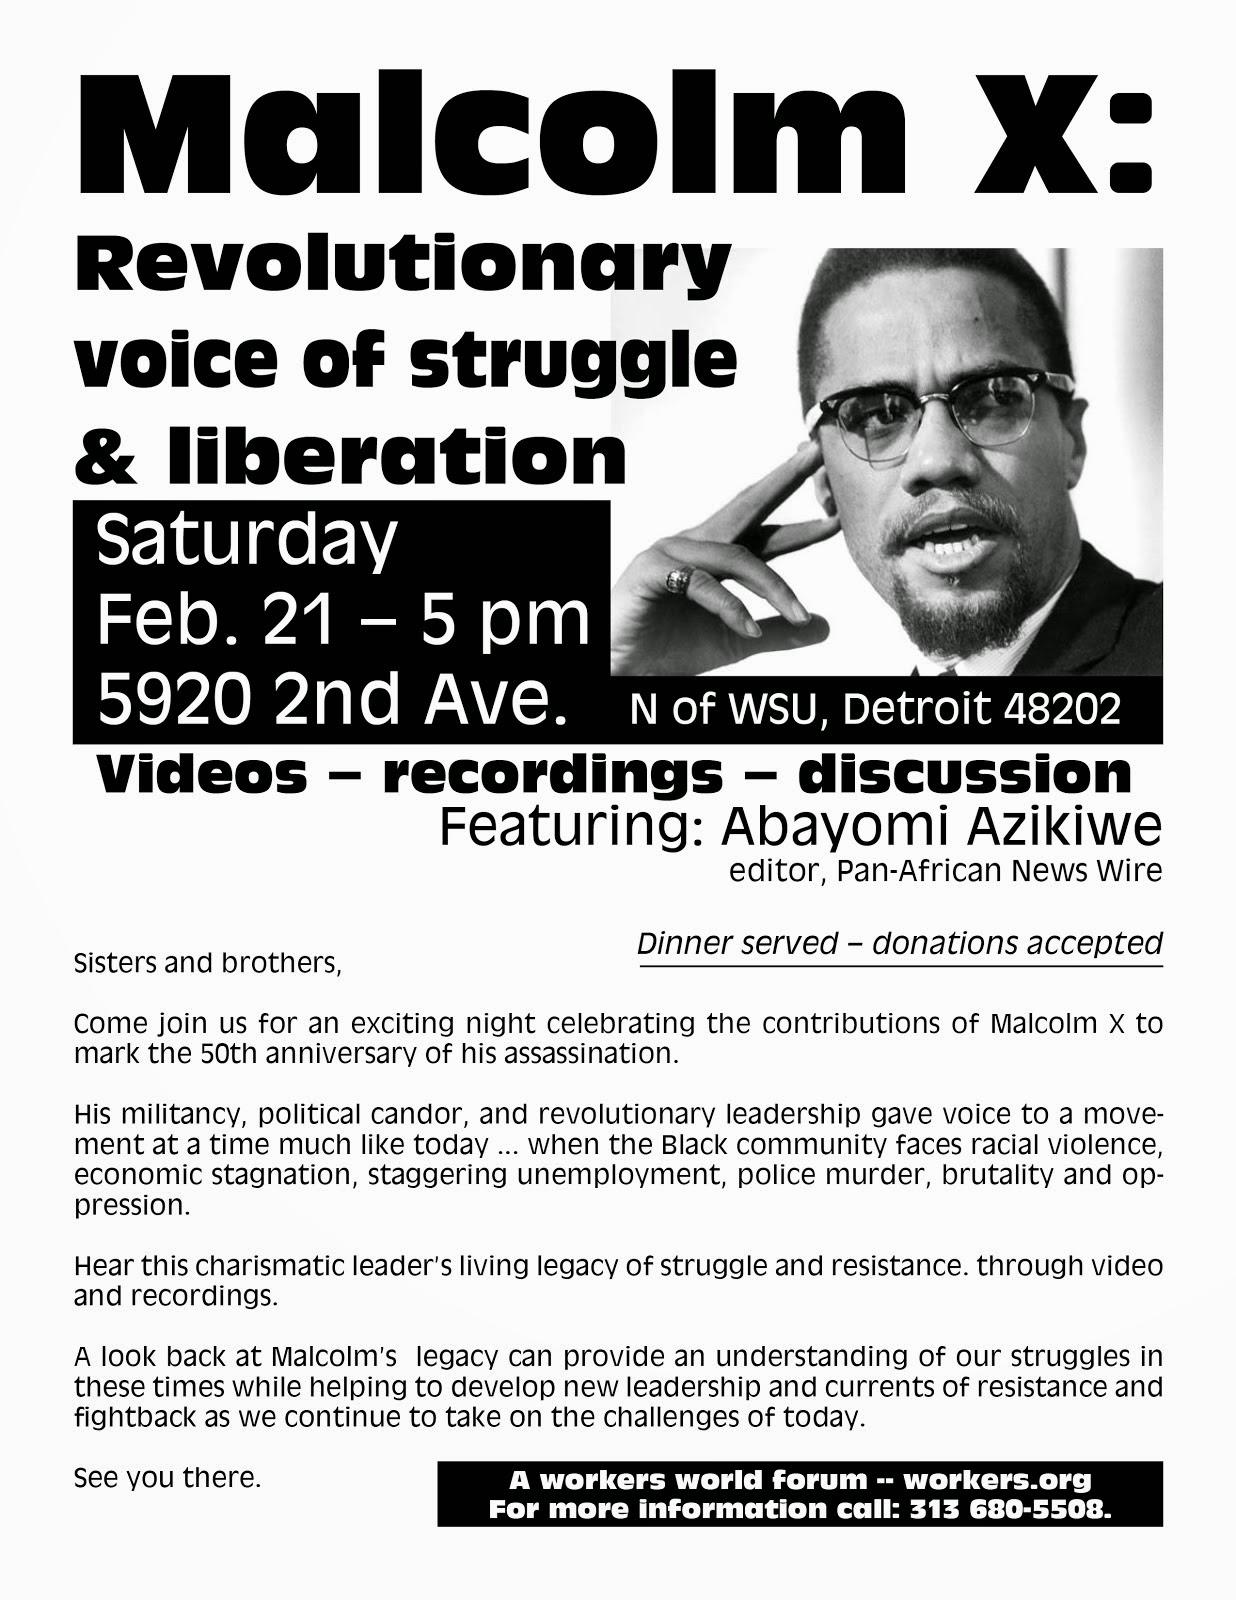 Abayomi Azikiwe Speaks on the Revolutionary Legacy of Malcolm X on Sat. Feb. 21, 2015, 5:00-8:00pm